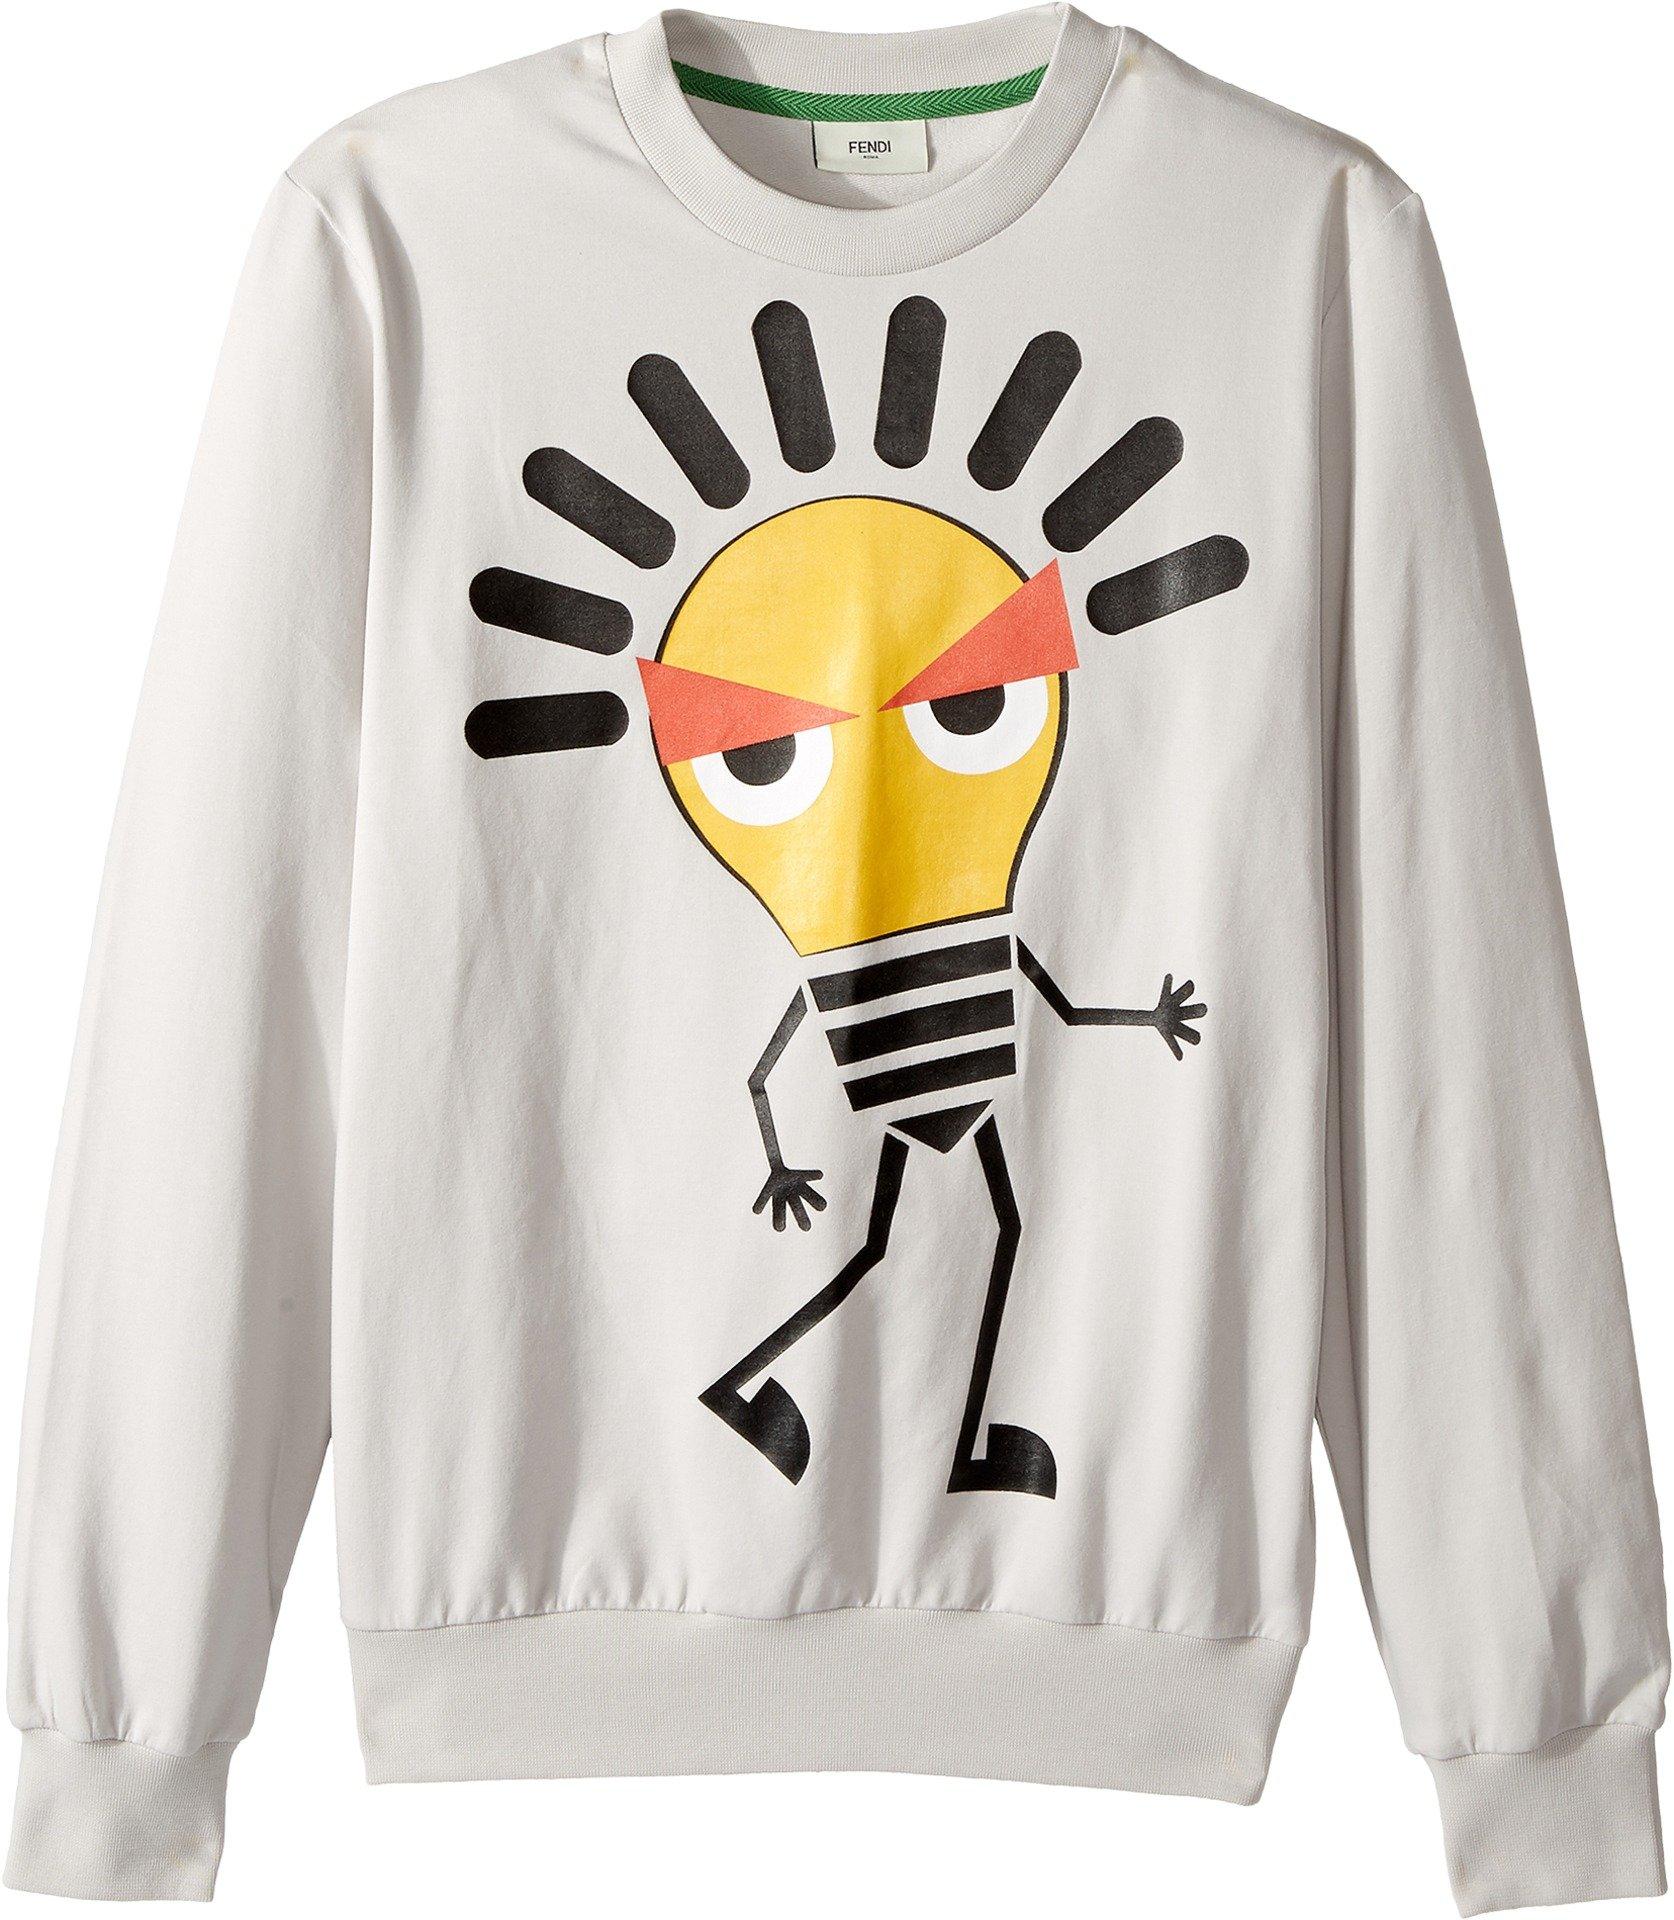 Fendi Kids  Boy's Long Sleeve Sweat Top w/ Lightbulb Design on Front (Big Kids) Light Grey Sweatshirt